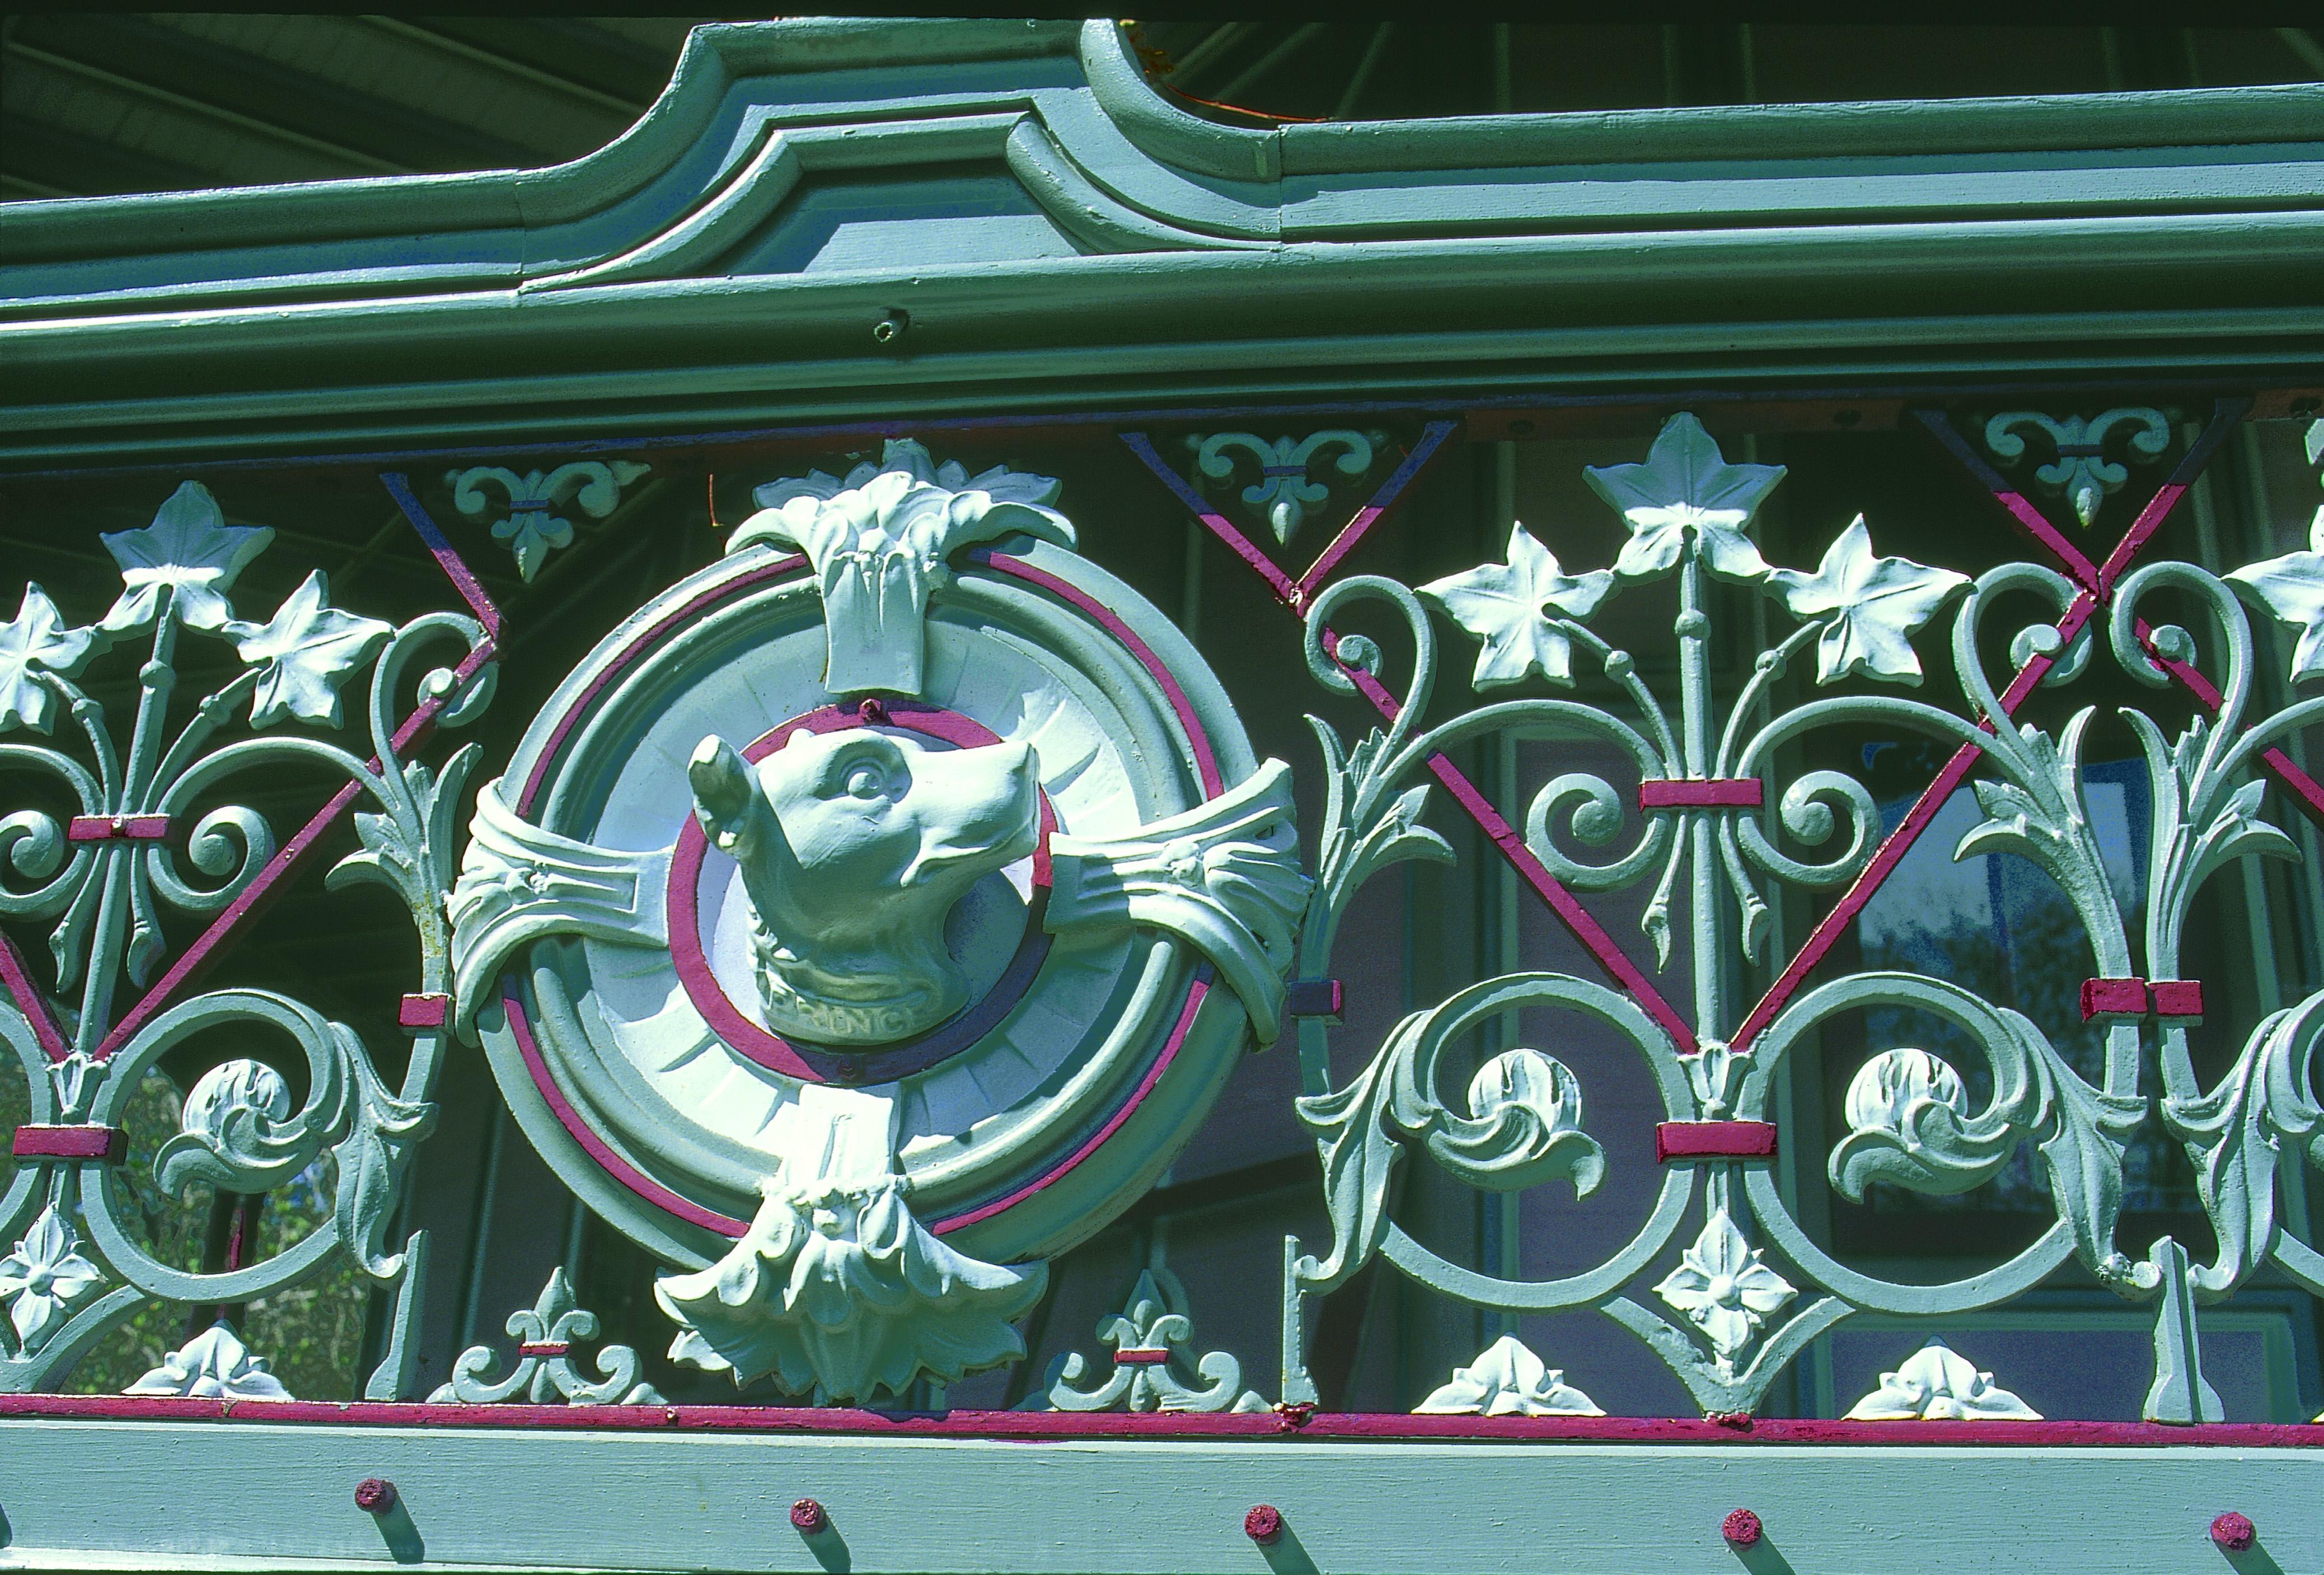 Ornamental Medallion on the Veranda Railing